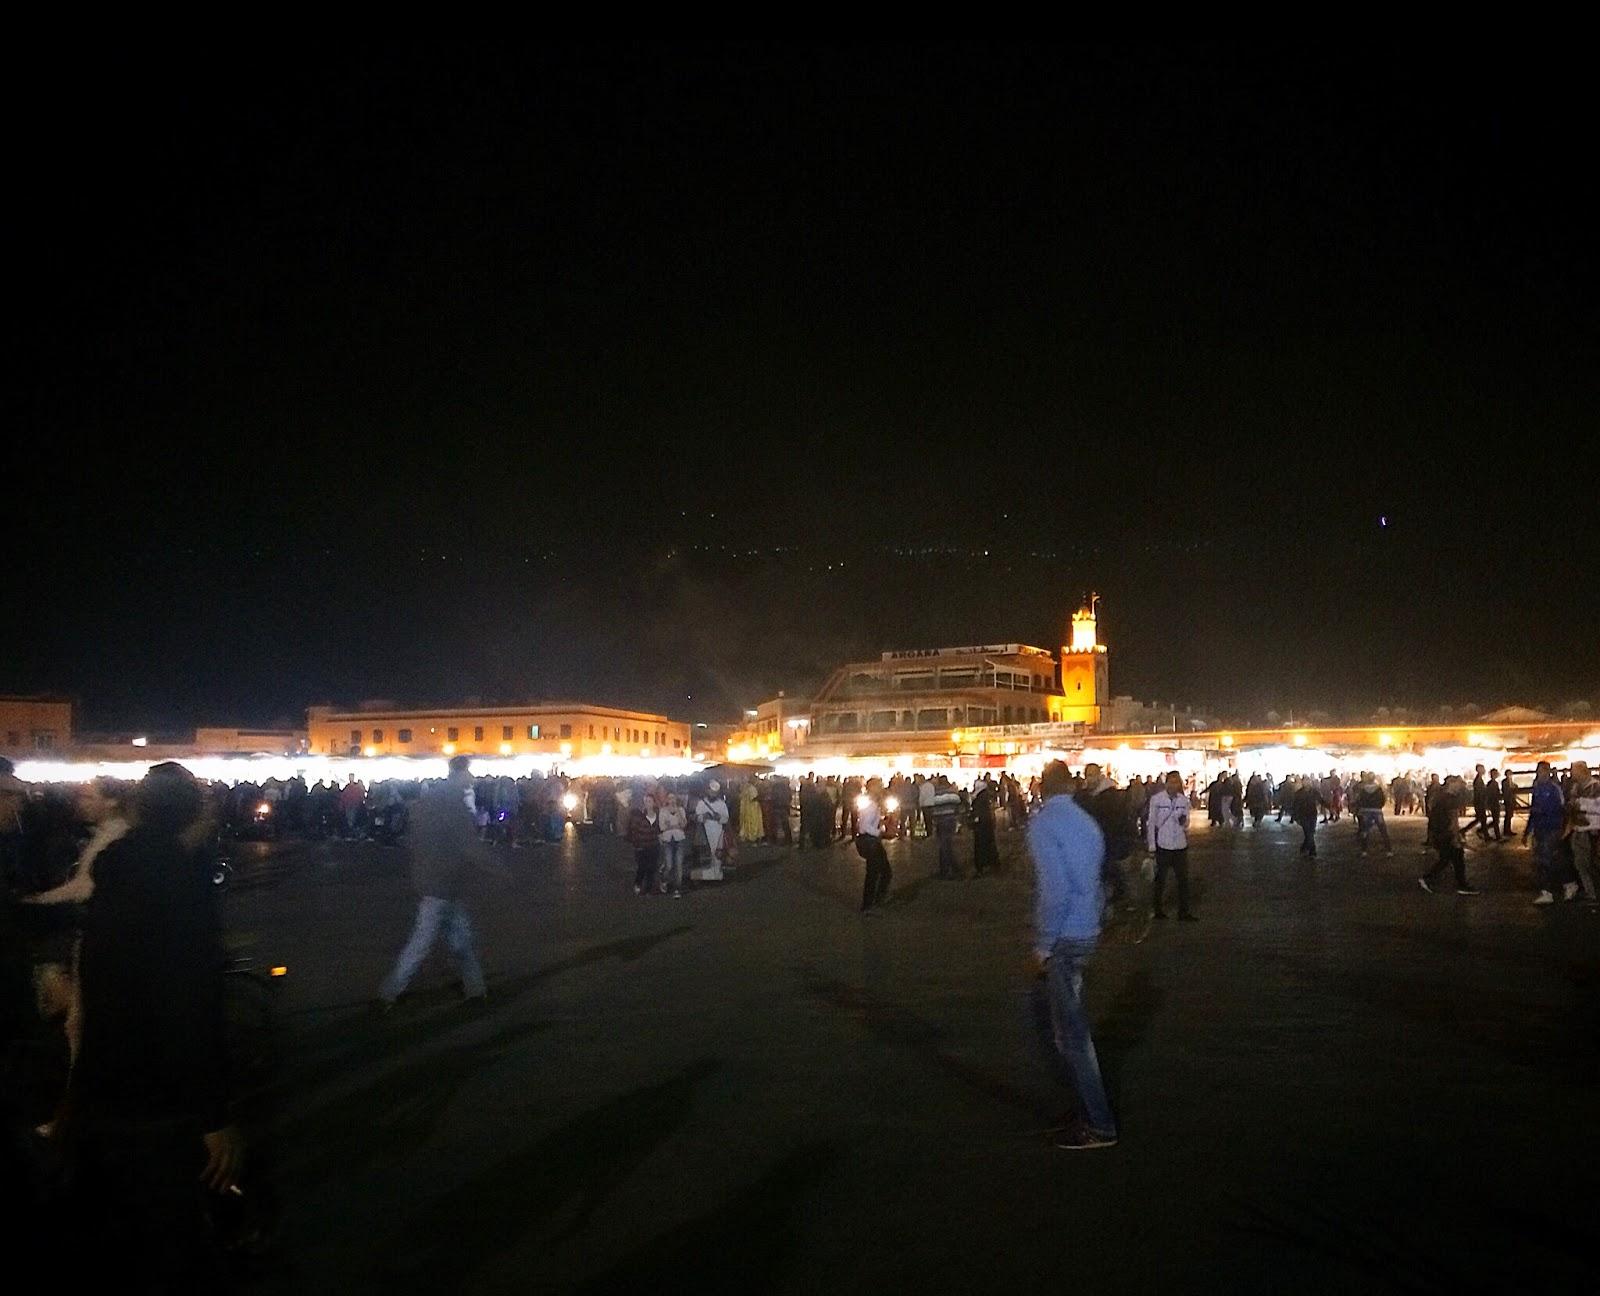 marrakech-morocco-maroc-night-market